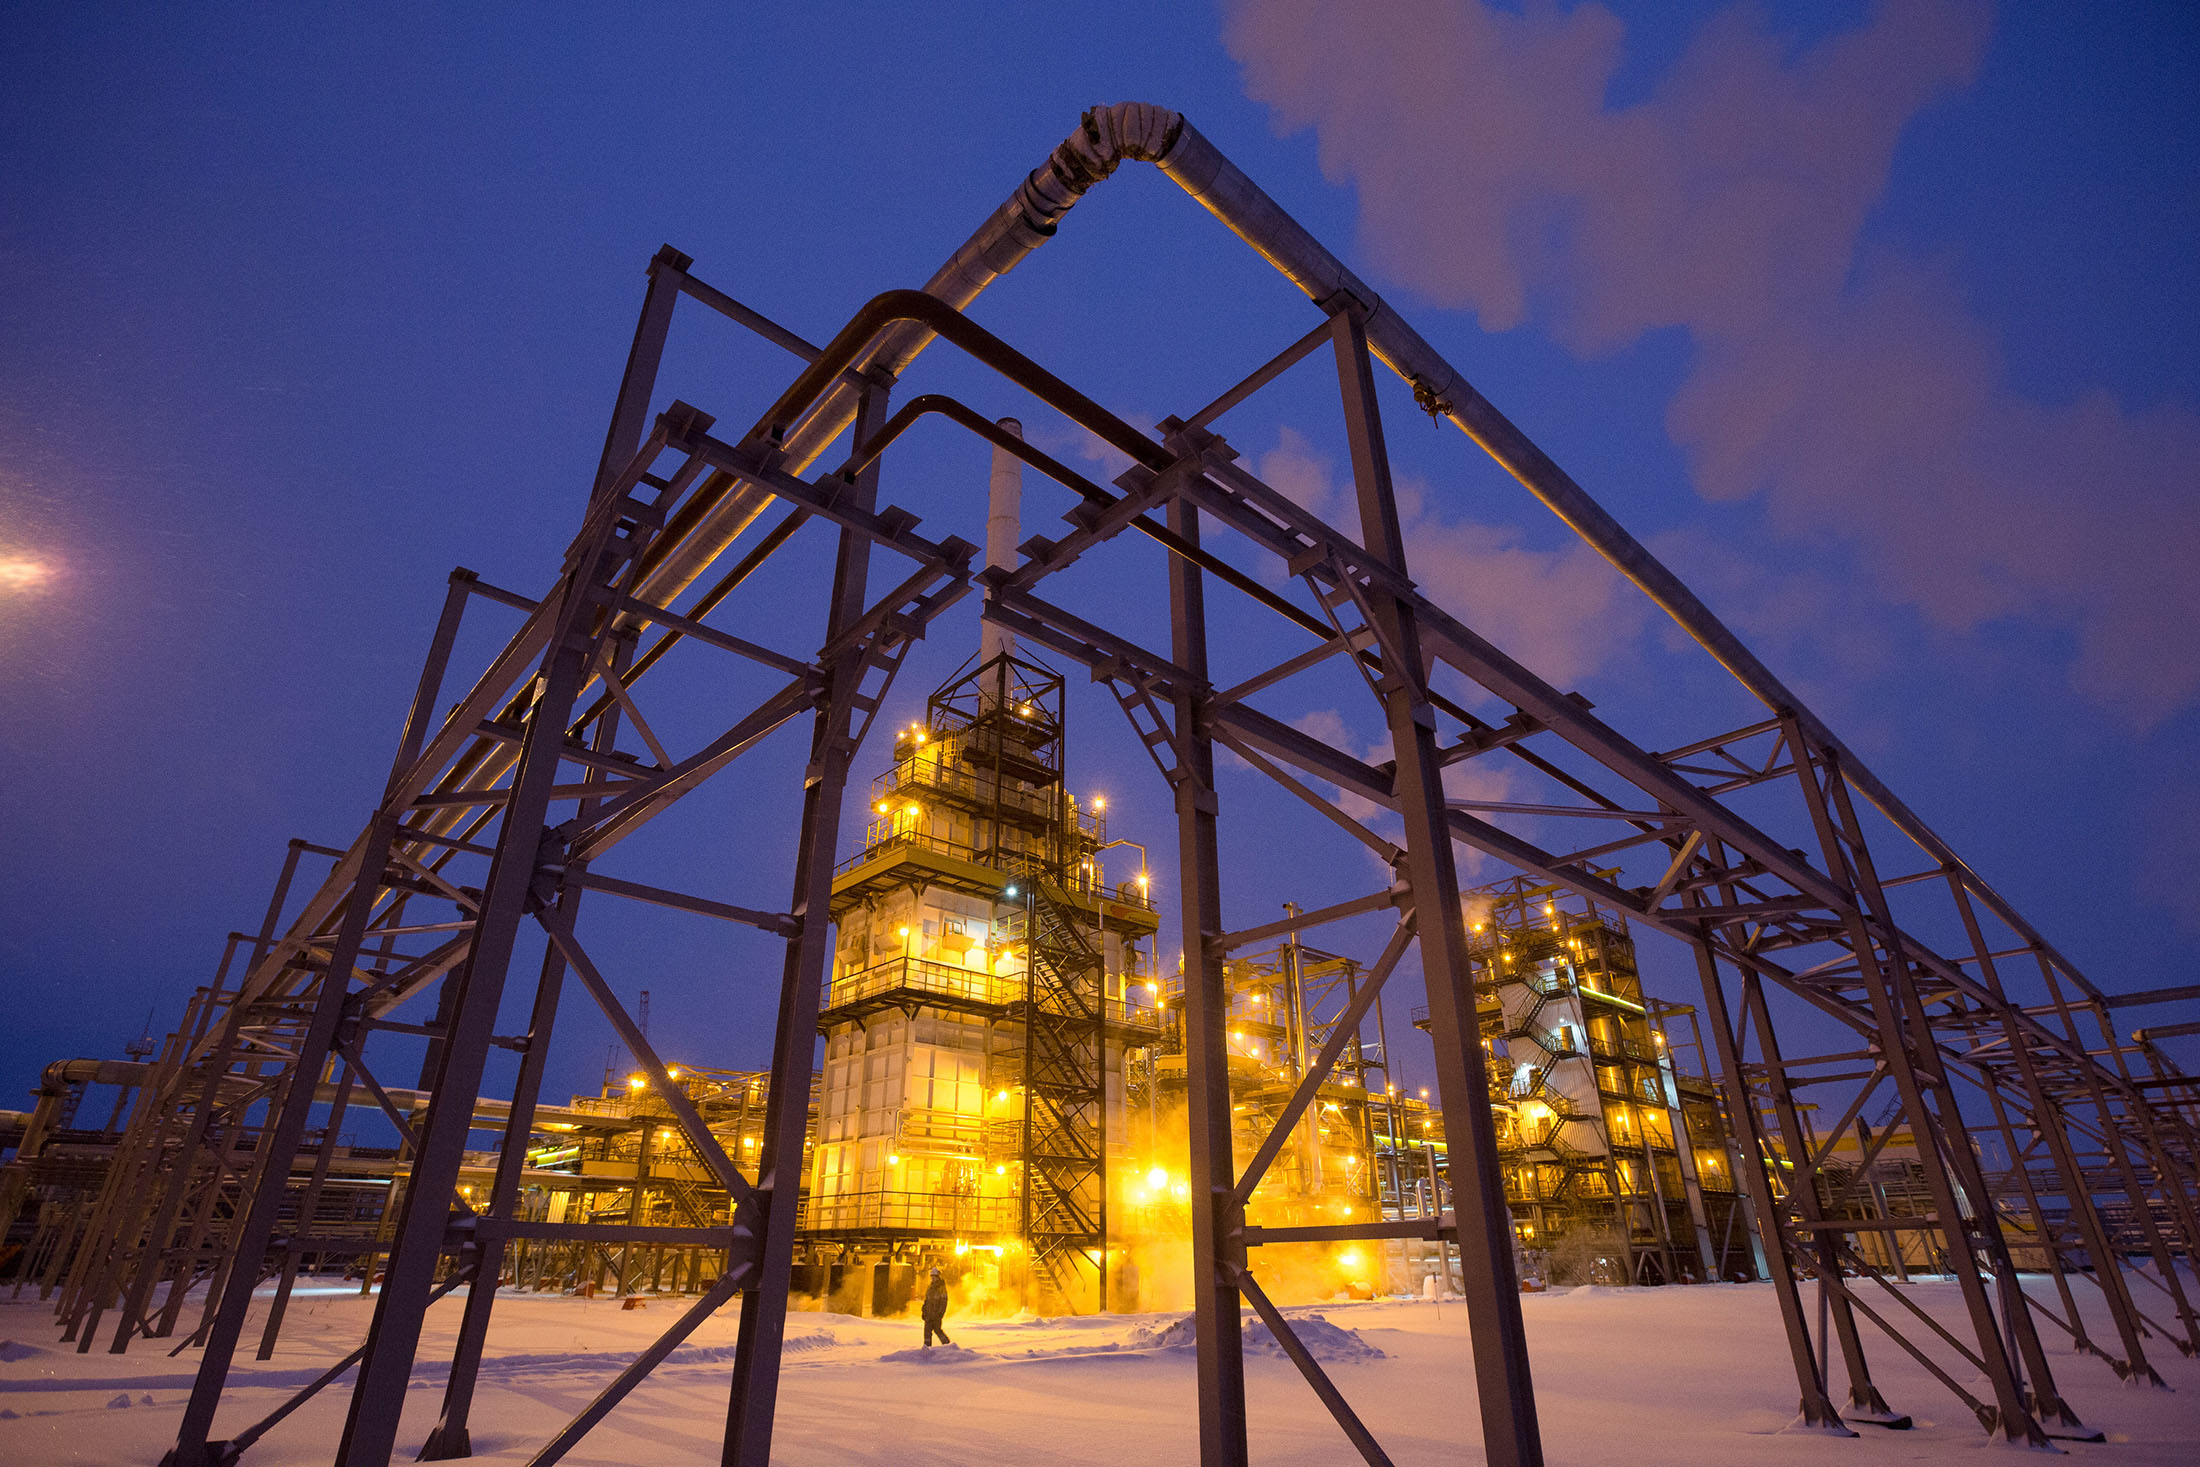 Lights illuminate the low-temperature isomerization unit at the Novokuibyshevsk oil refinery plant, operated by Rosneft PJSC, in Novokuibyshevsk, Samara region, Russia, on Wednesday, Dec. 21, 2016.